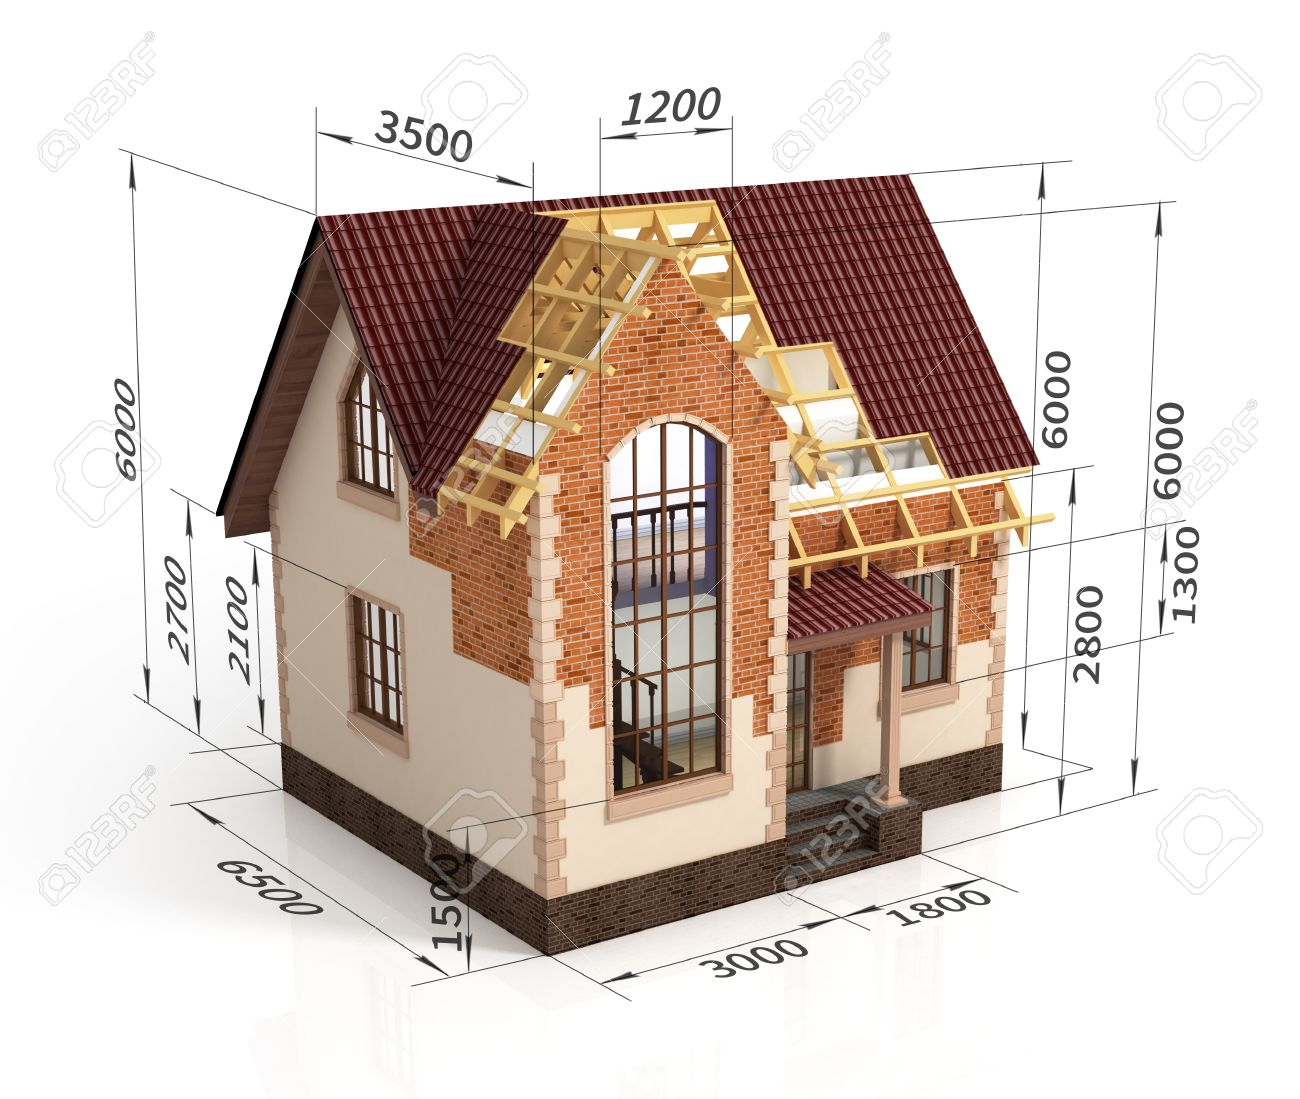 onstruction Haus Planen Design Mischung Übergang bbildung ... size: 1300 x 1099 post ID: 0 File size: 0 B